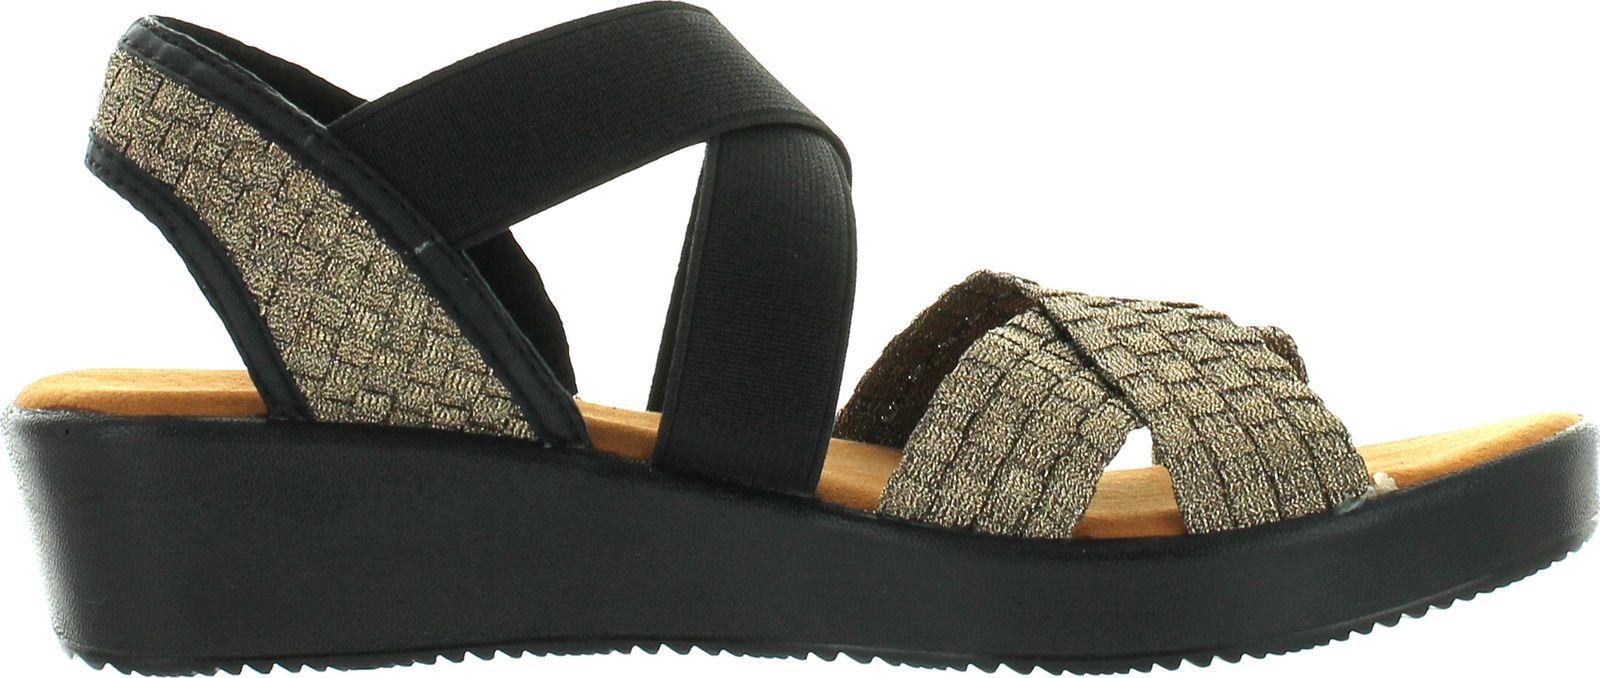 Bernie Mev donna Strappy Fashion Sandals Sandals Sandals 9c7876